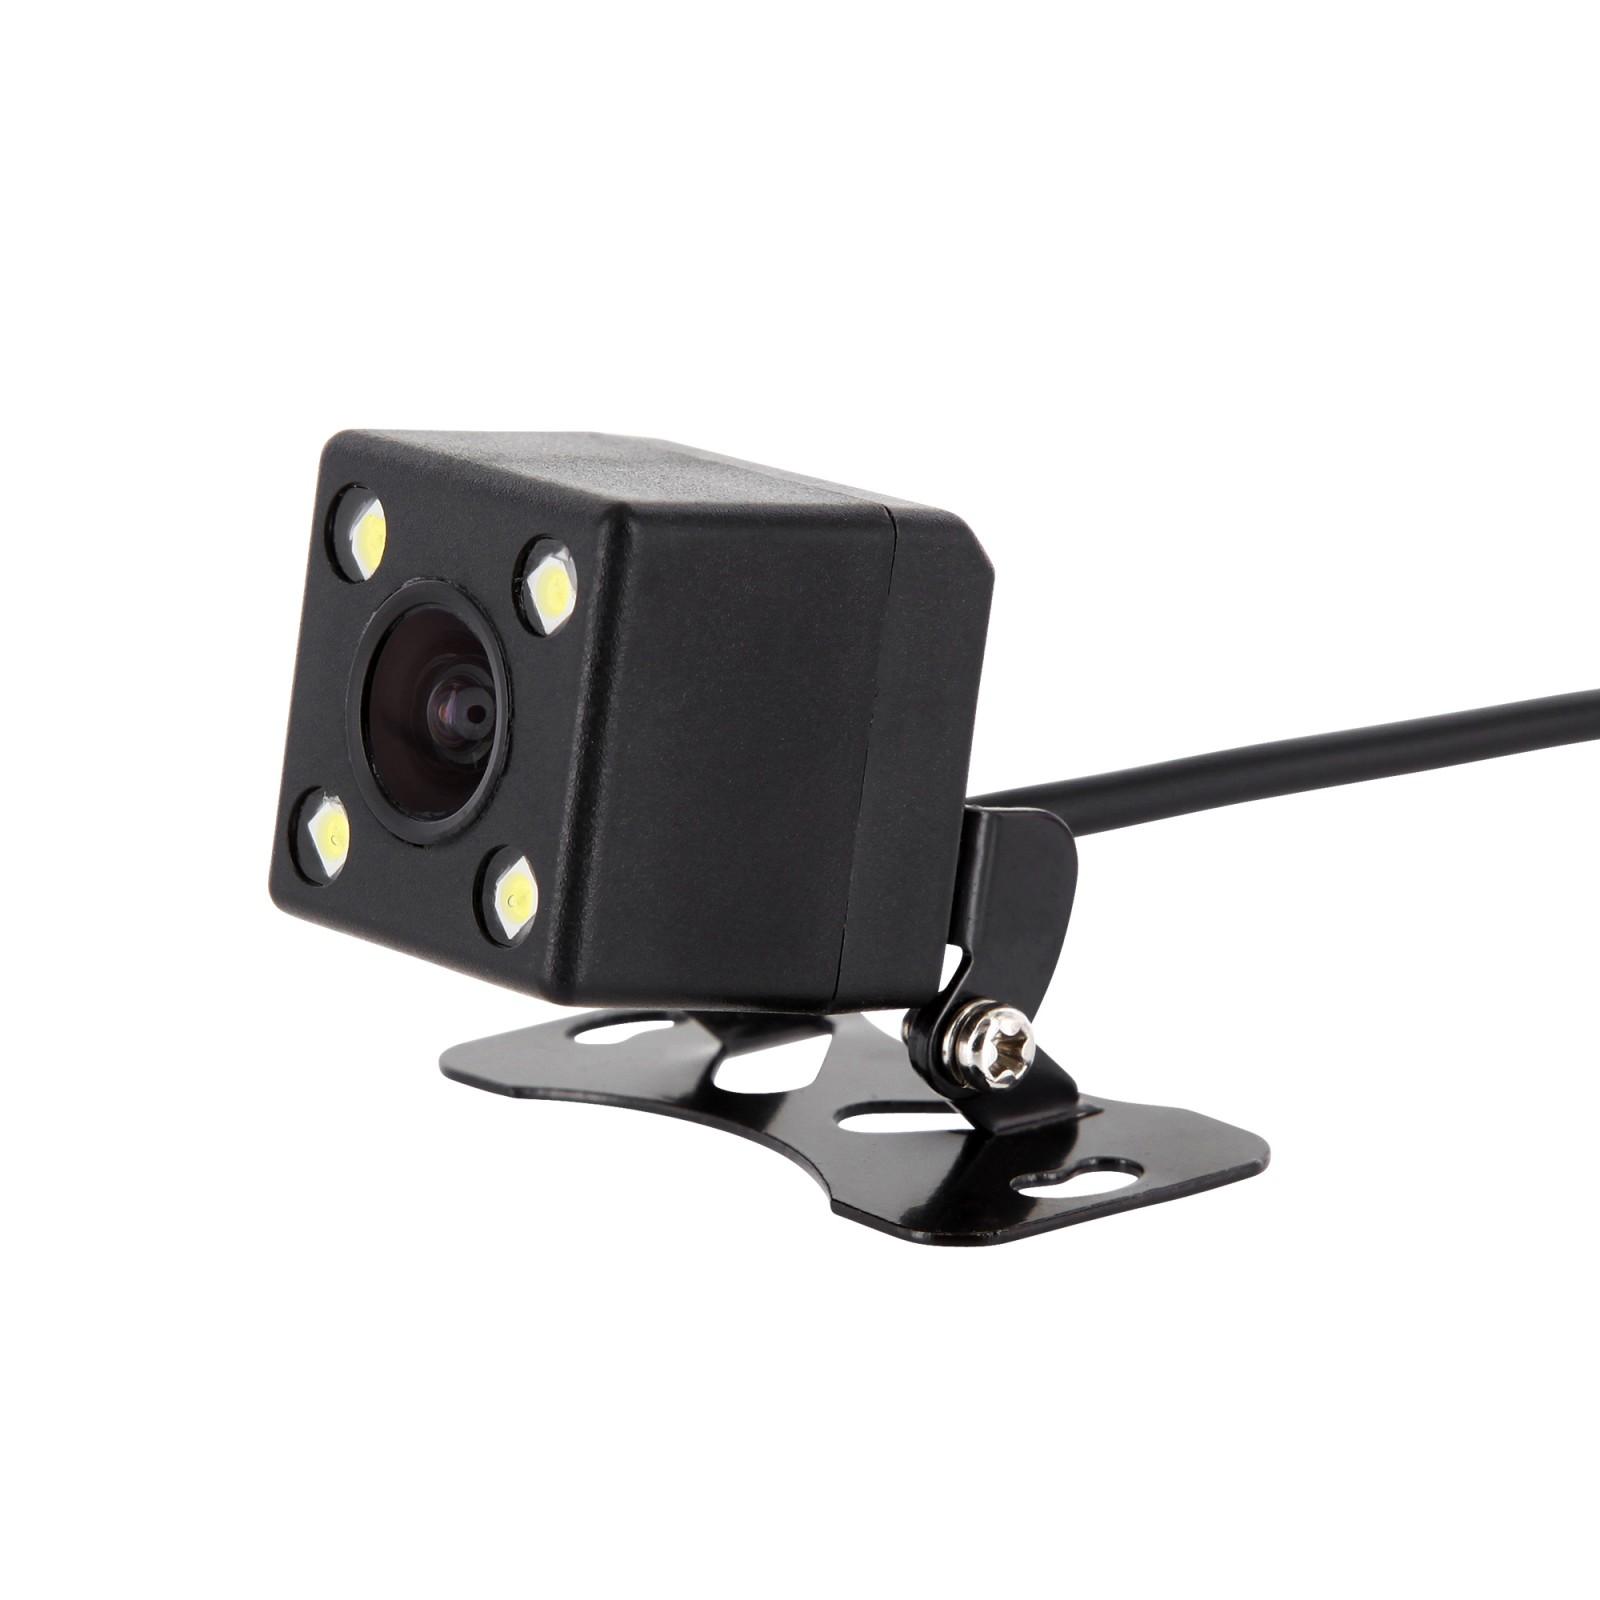 5 zoll tft lcd monitor mit mini r ckfahrkamera auto. Black Bedroom Furniture Sets. Home Design Ideas